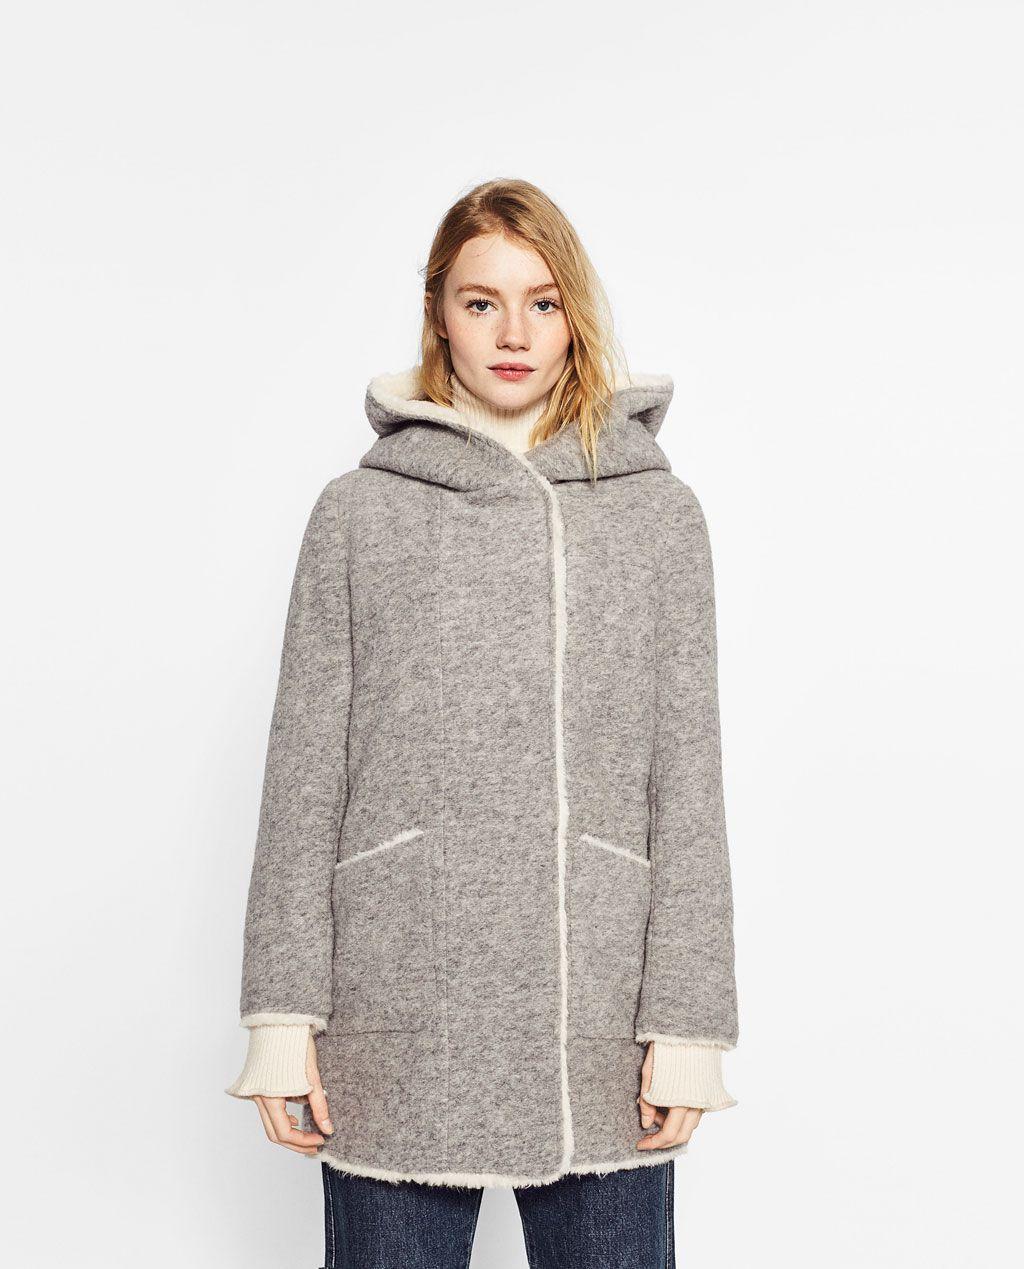 ABRIGO FORRO INTERIOR BORREGO | Zara Women Winter Wardrobe And Autumn